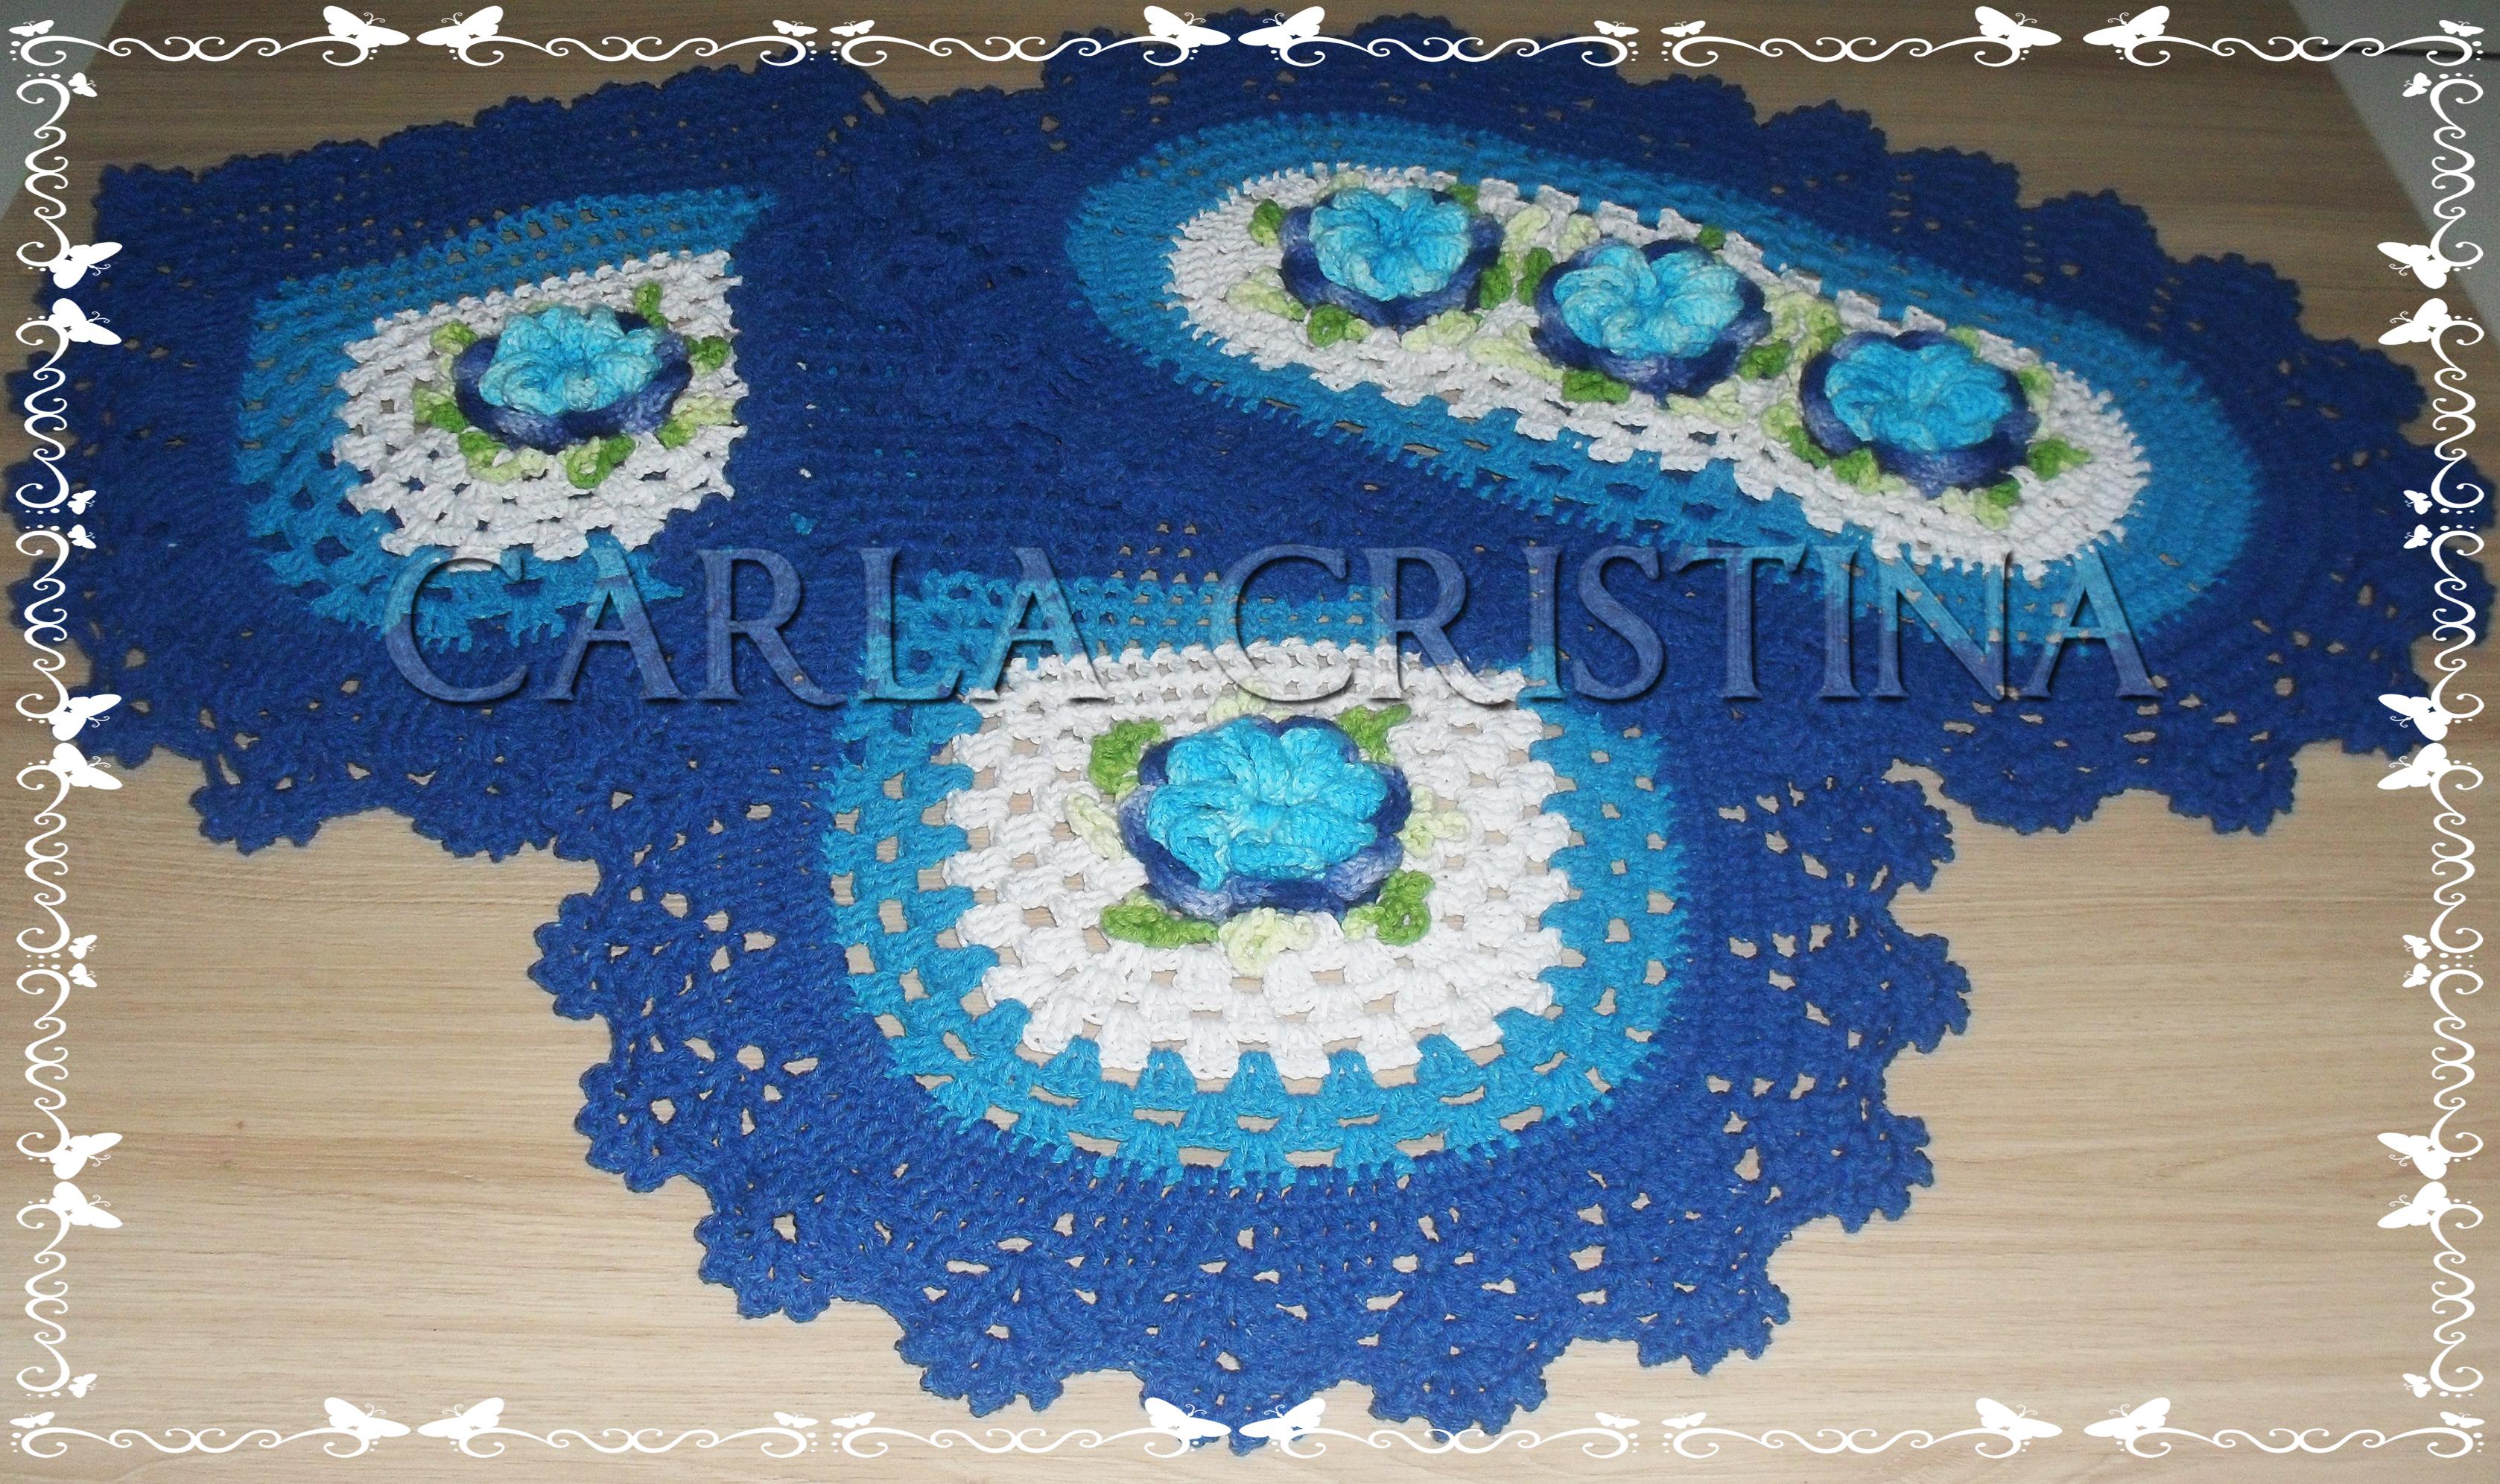 Jogo Banheiro Azul Croche : Jogo de banheiro azul pe?as carla cristina e crochet